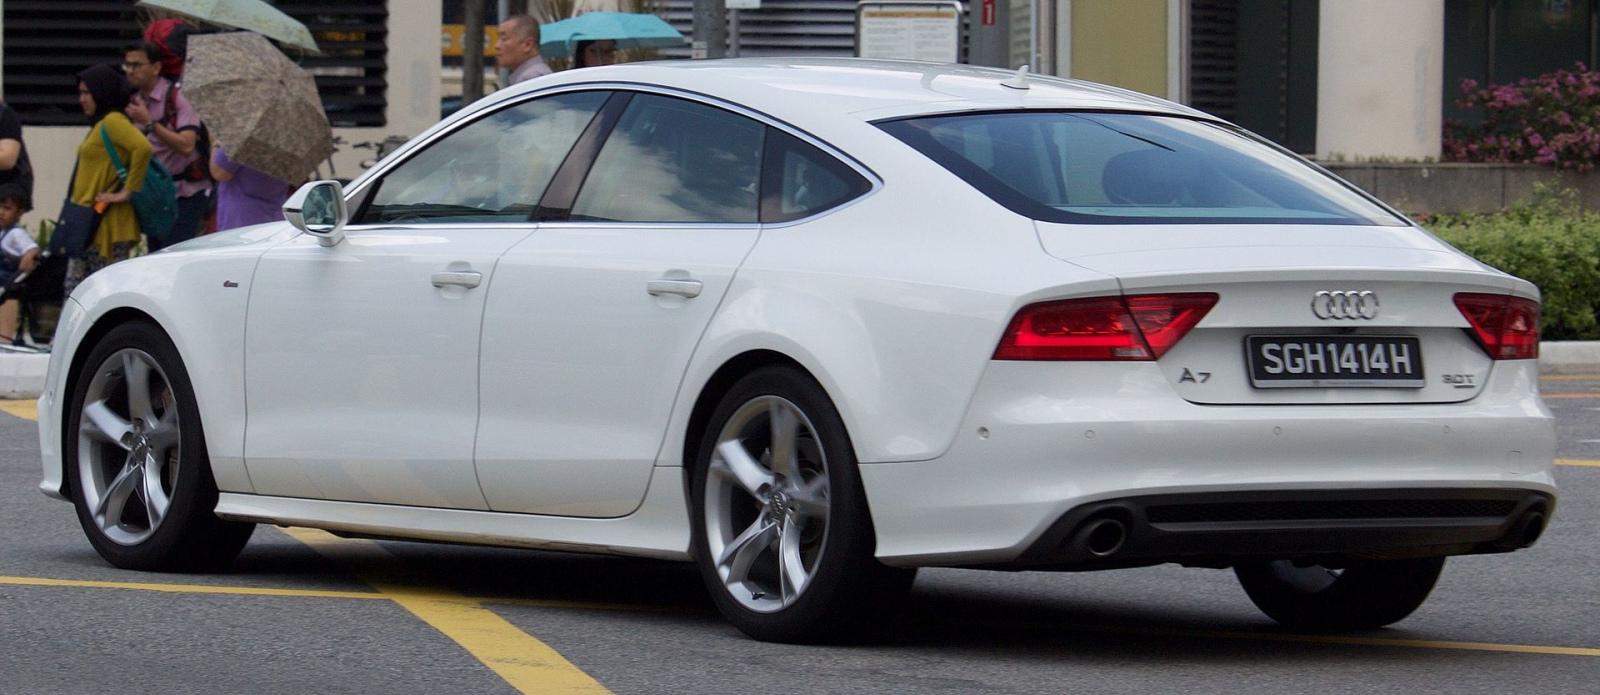 2011_Audi_A7_(4G)_3.0_TFSI_quattro_hatchback_(2016-01-07)_02.jpg